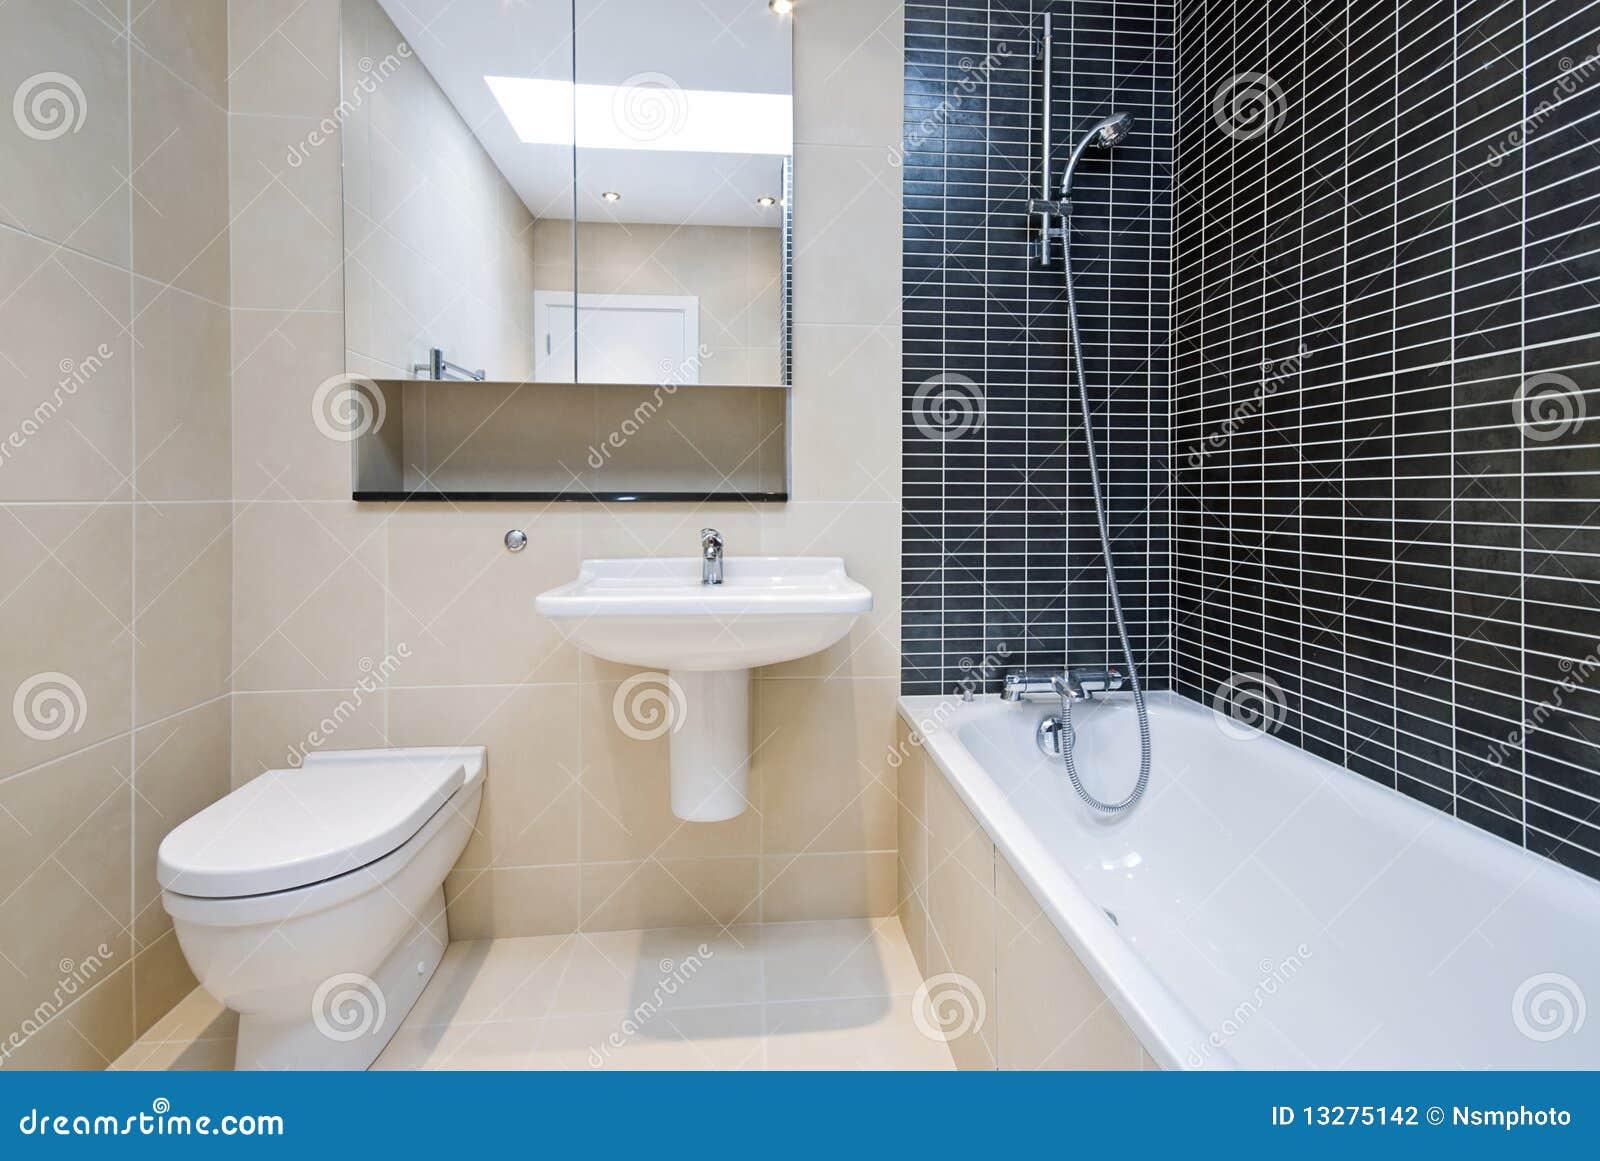 Salle De Bain Moderne Beige – LoMBaRdS